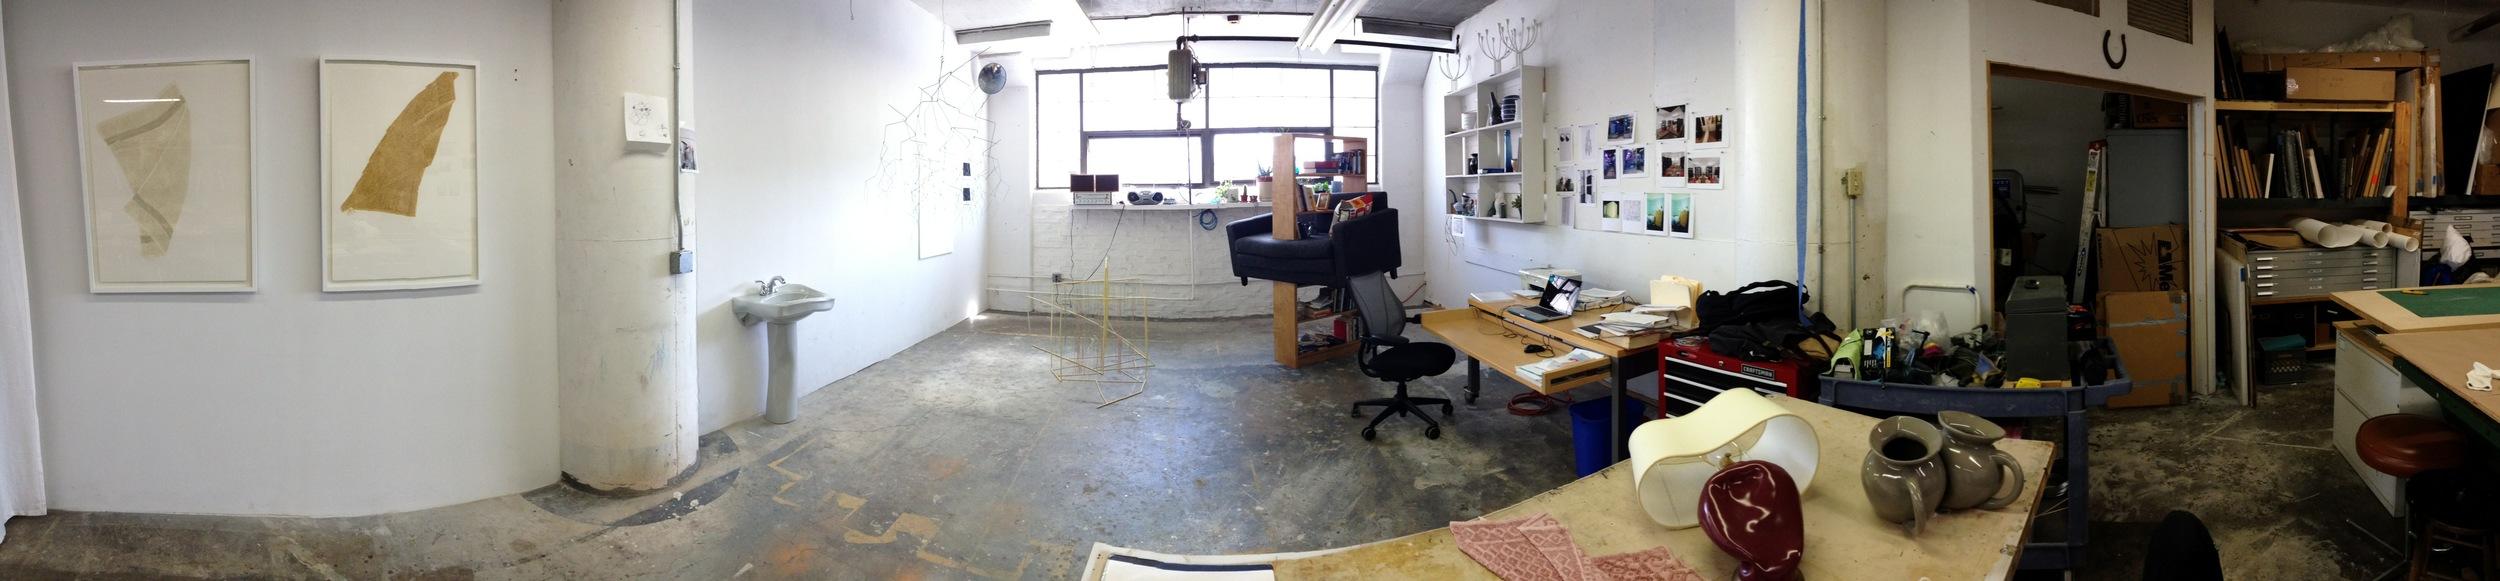 Beth Campbell Studio, Brooklyn Navy Yards Photo Credit: Cincala Art Advisory